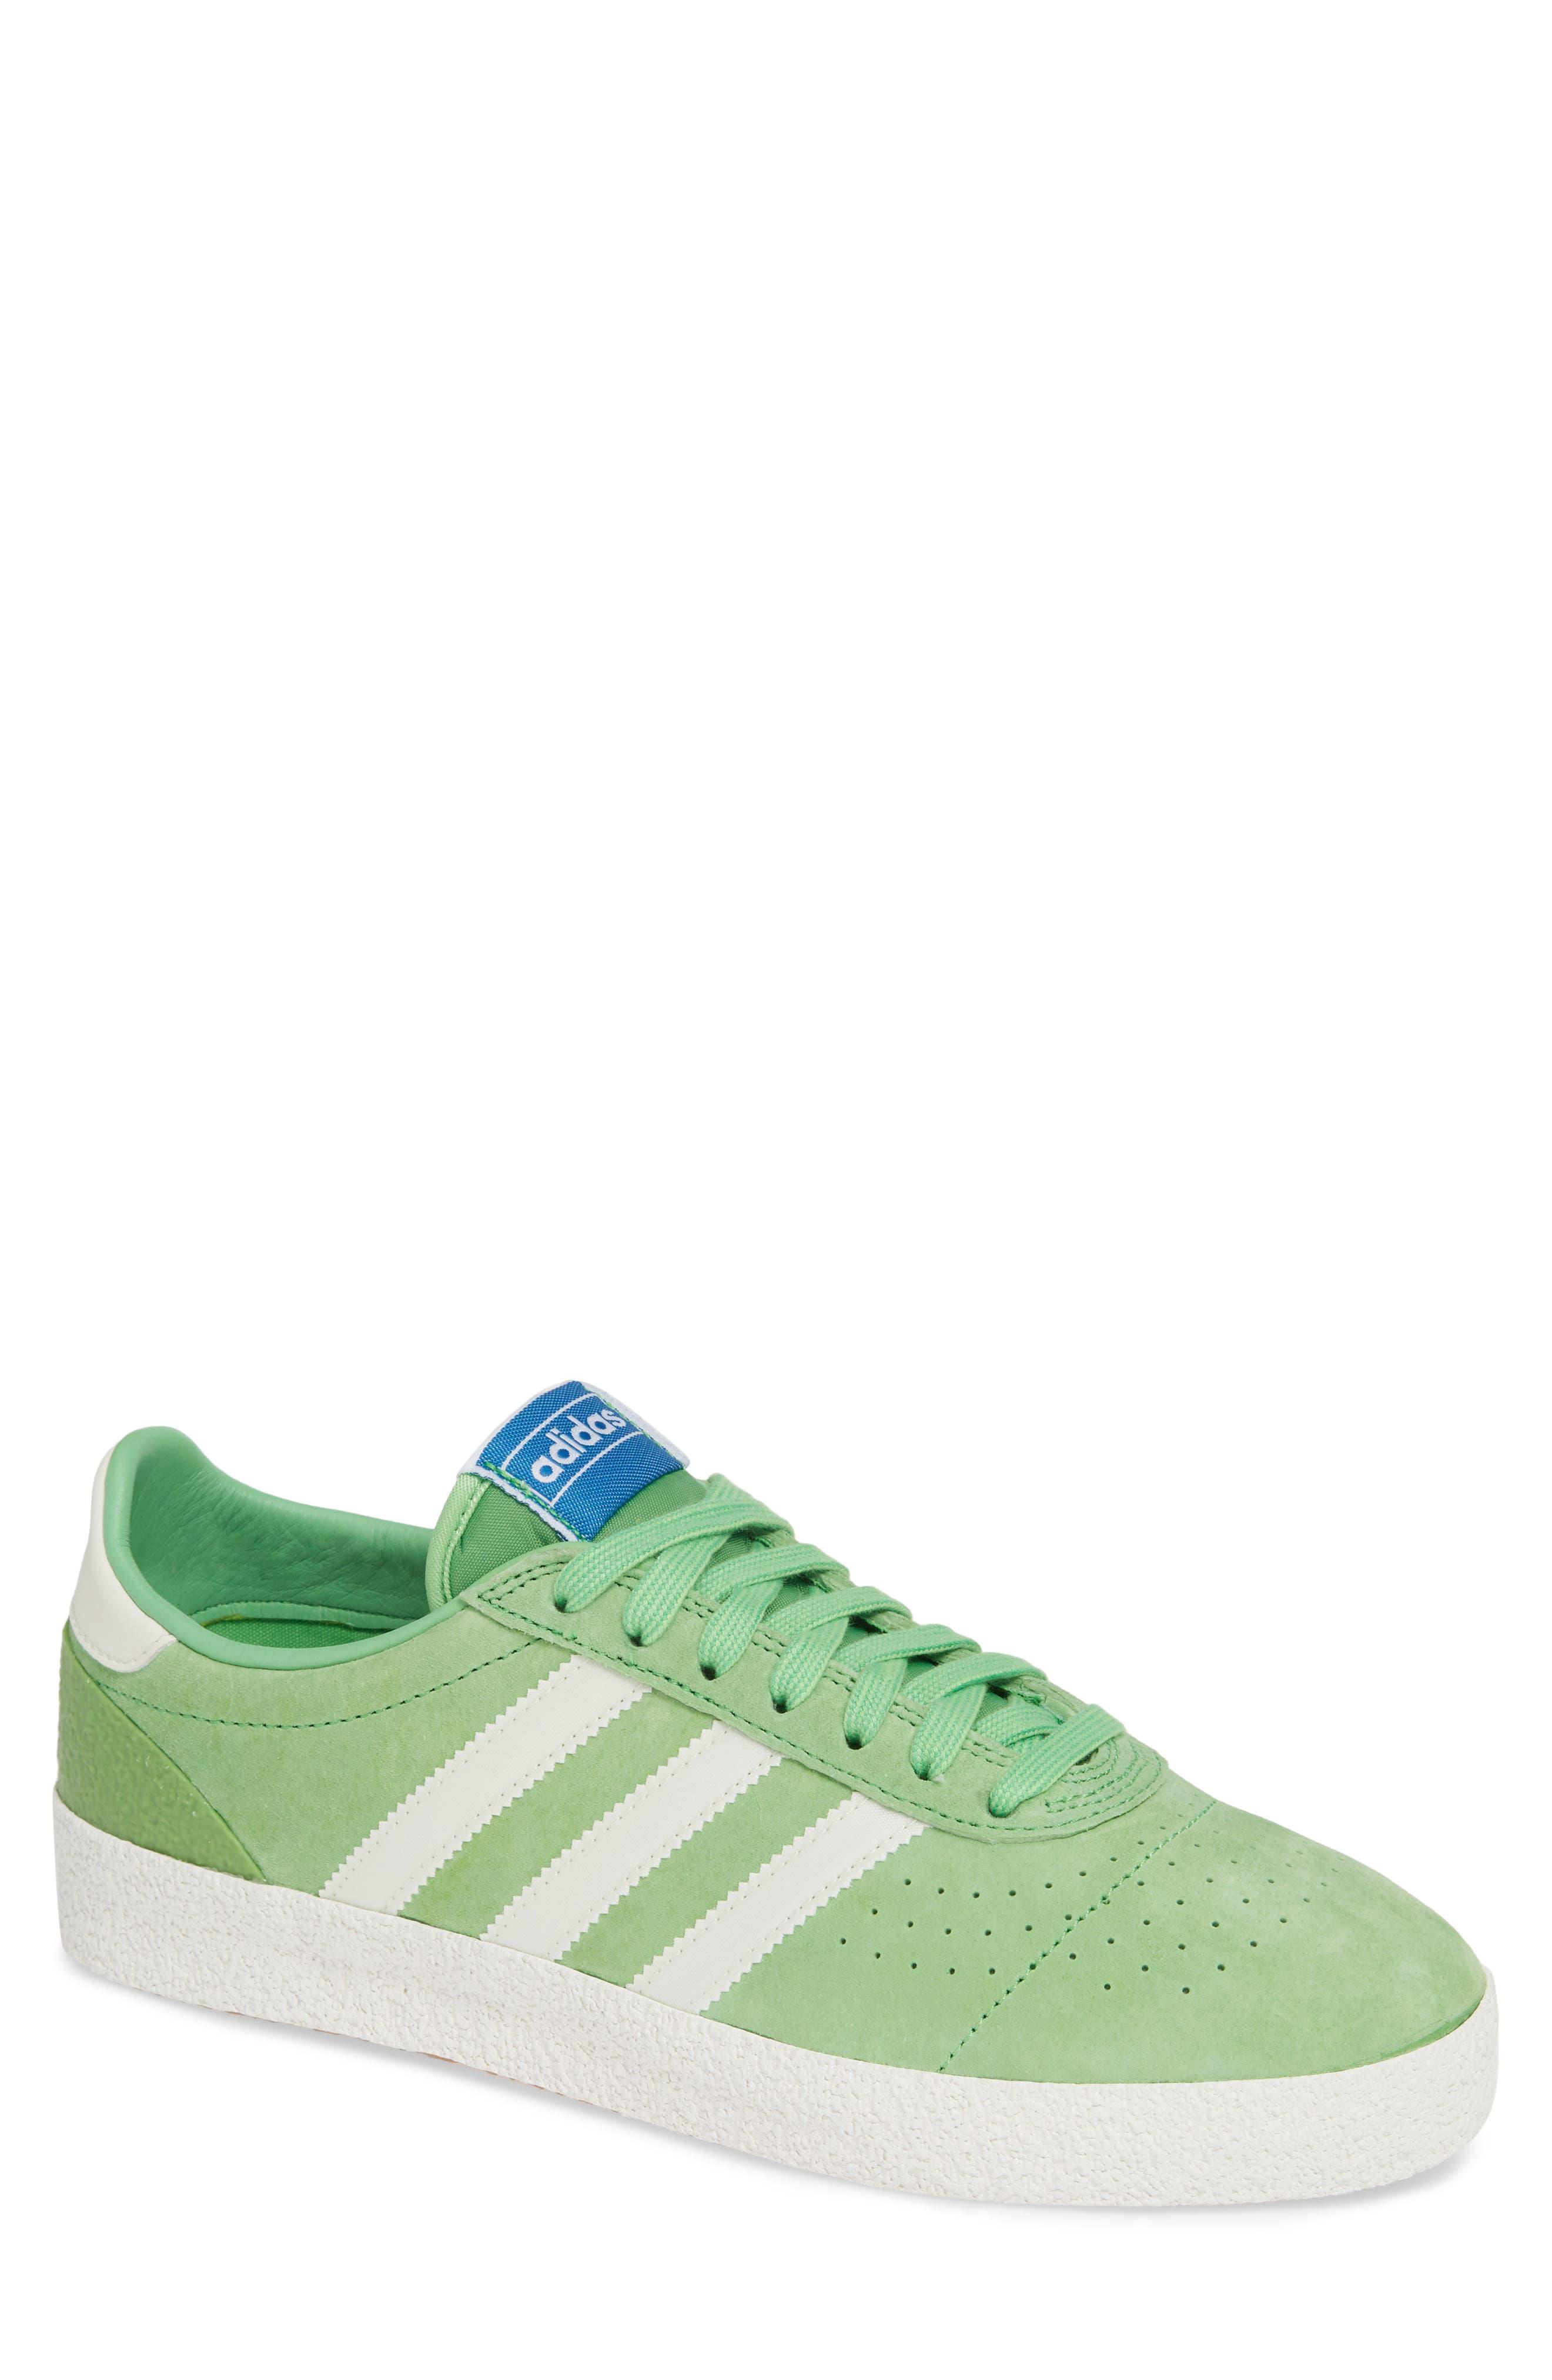 München Super Spezial Sneaker,                             Main thumbnail 1, color,                             INTENSE GREEN/ OFF WHITE